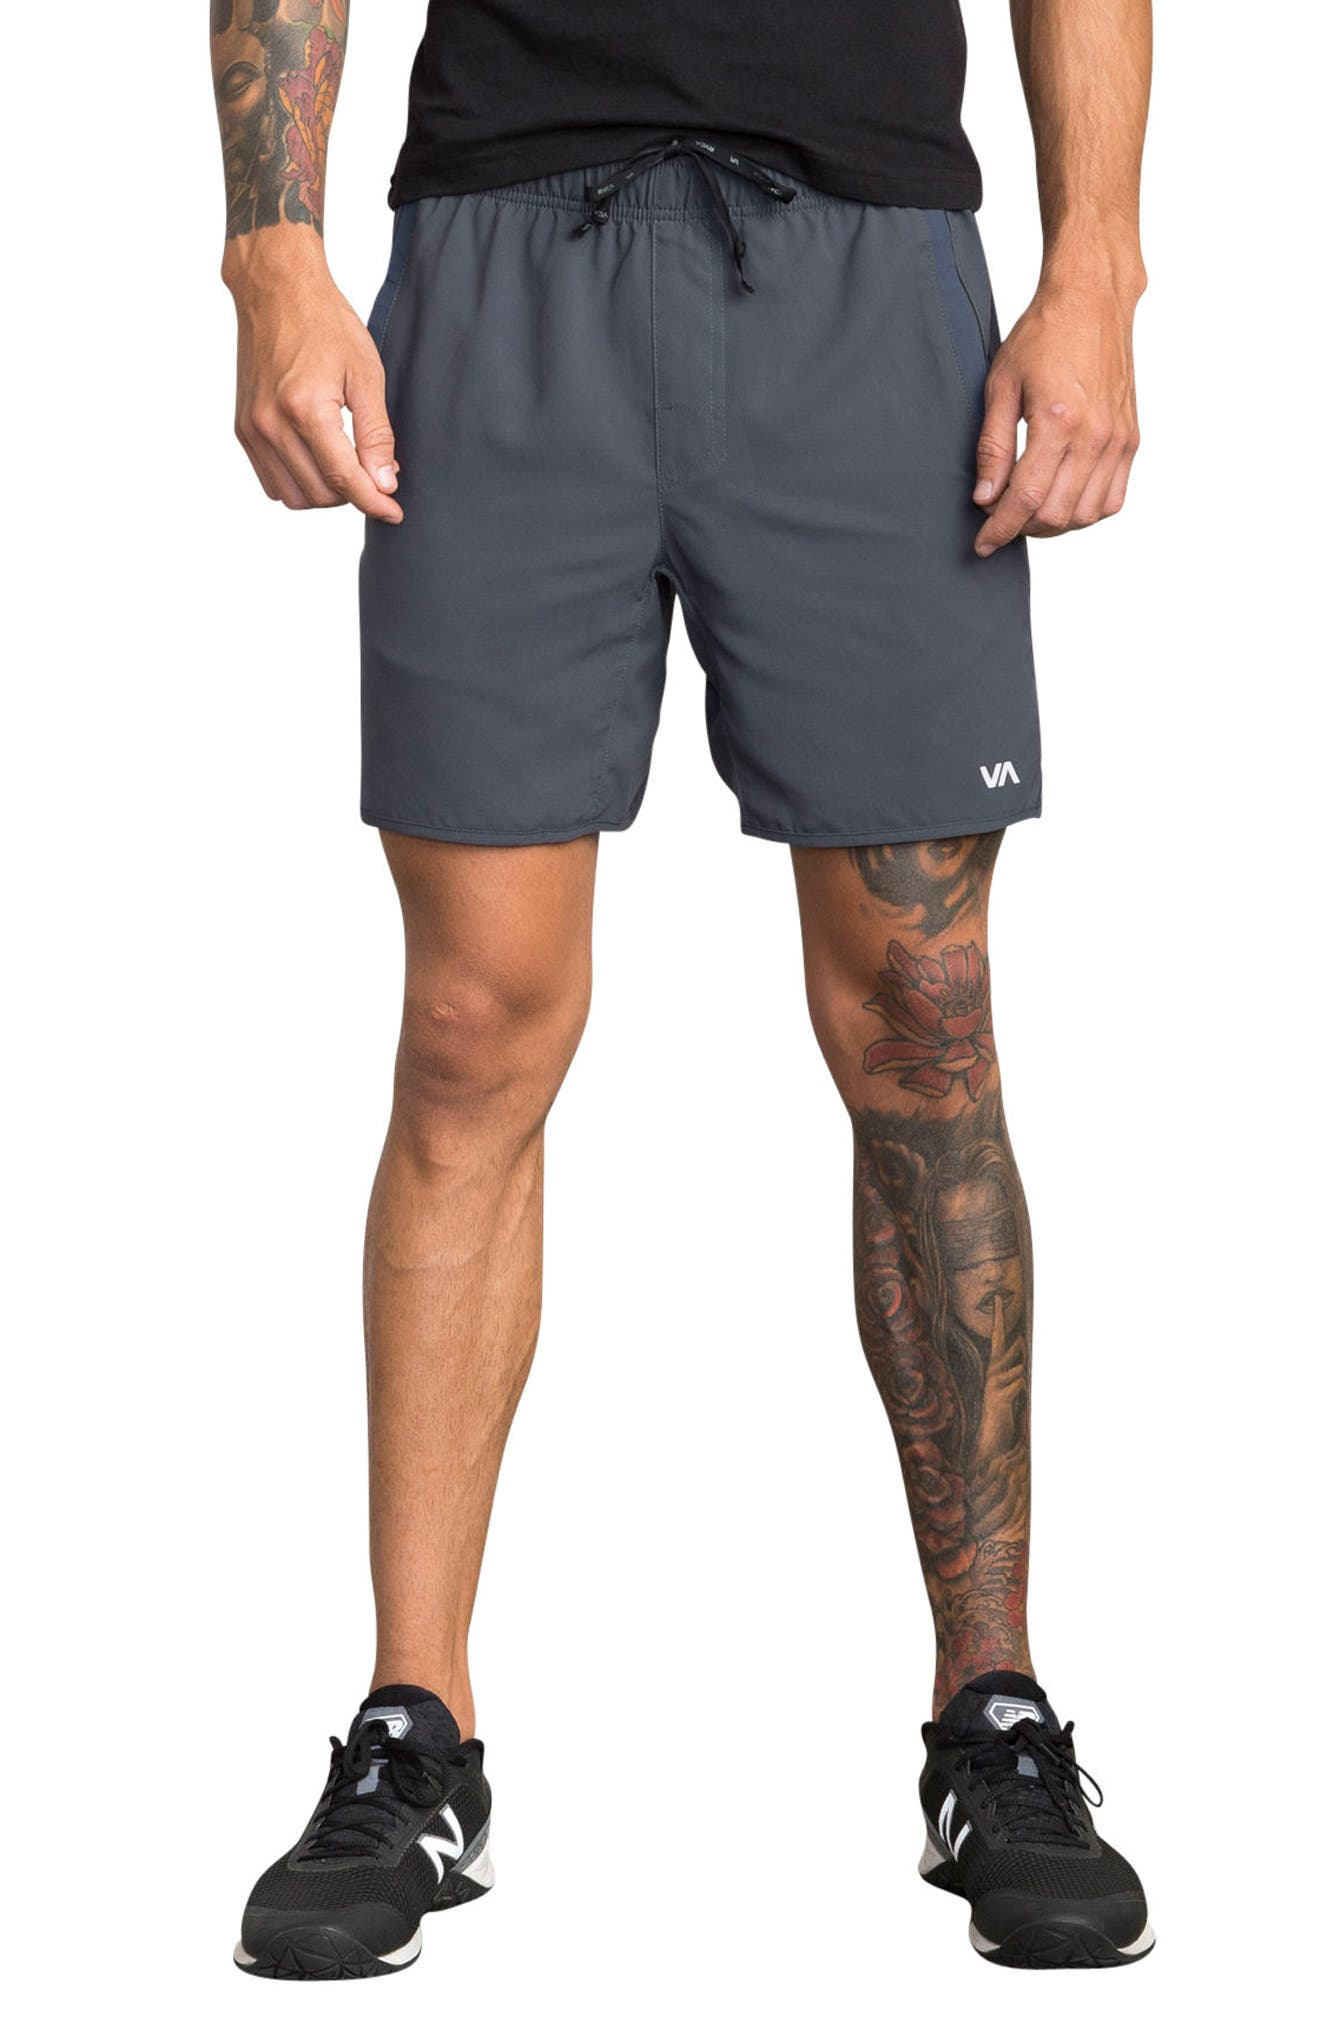 Alternate Image 1 Selected - RVCA Yogger III Athletic Shorts